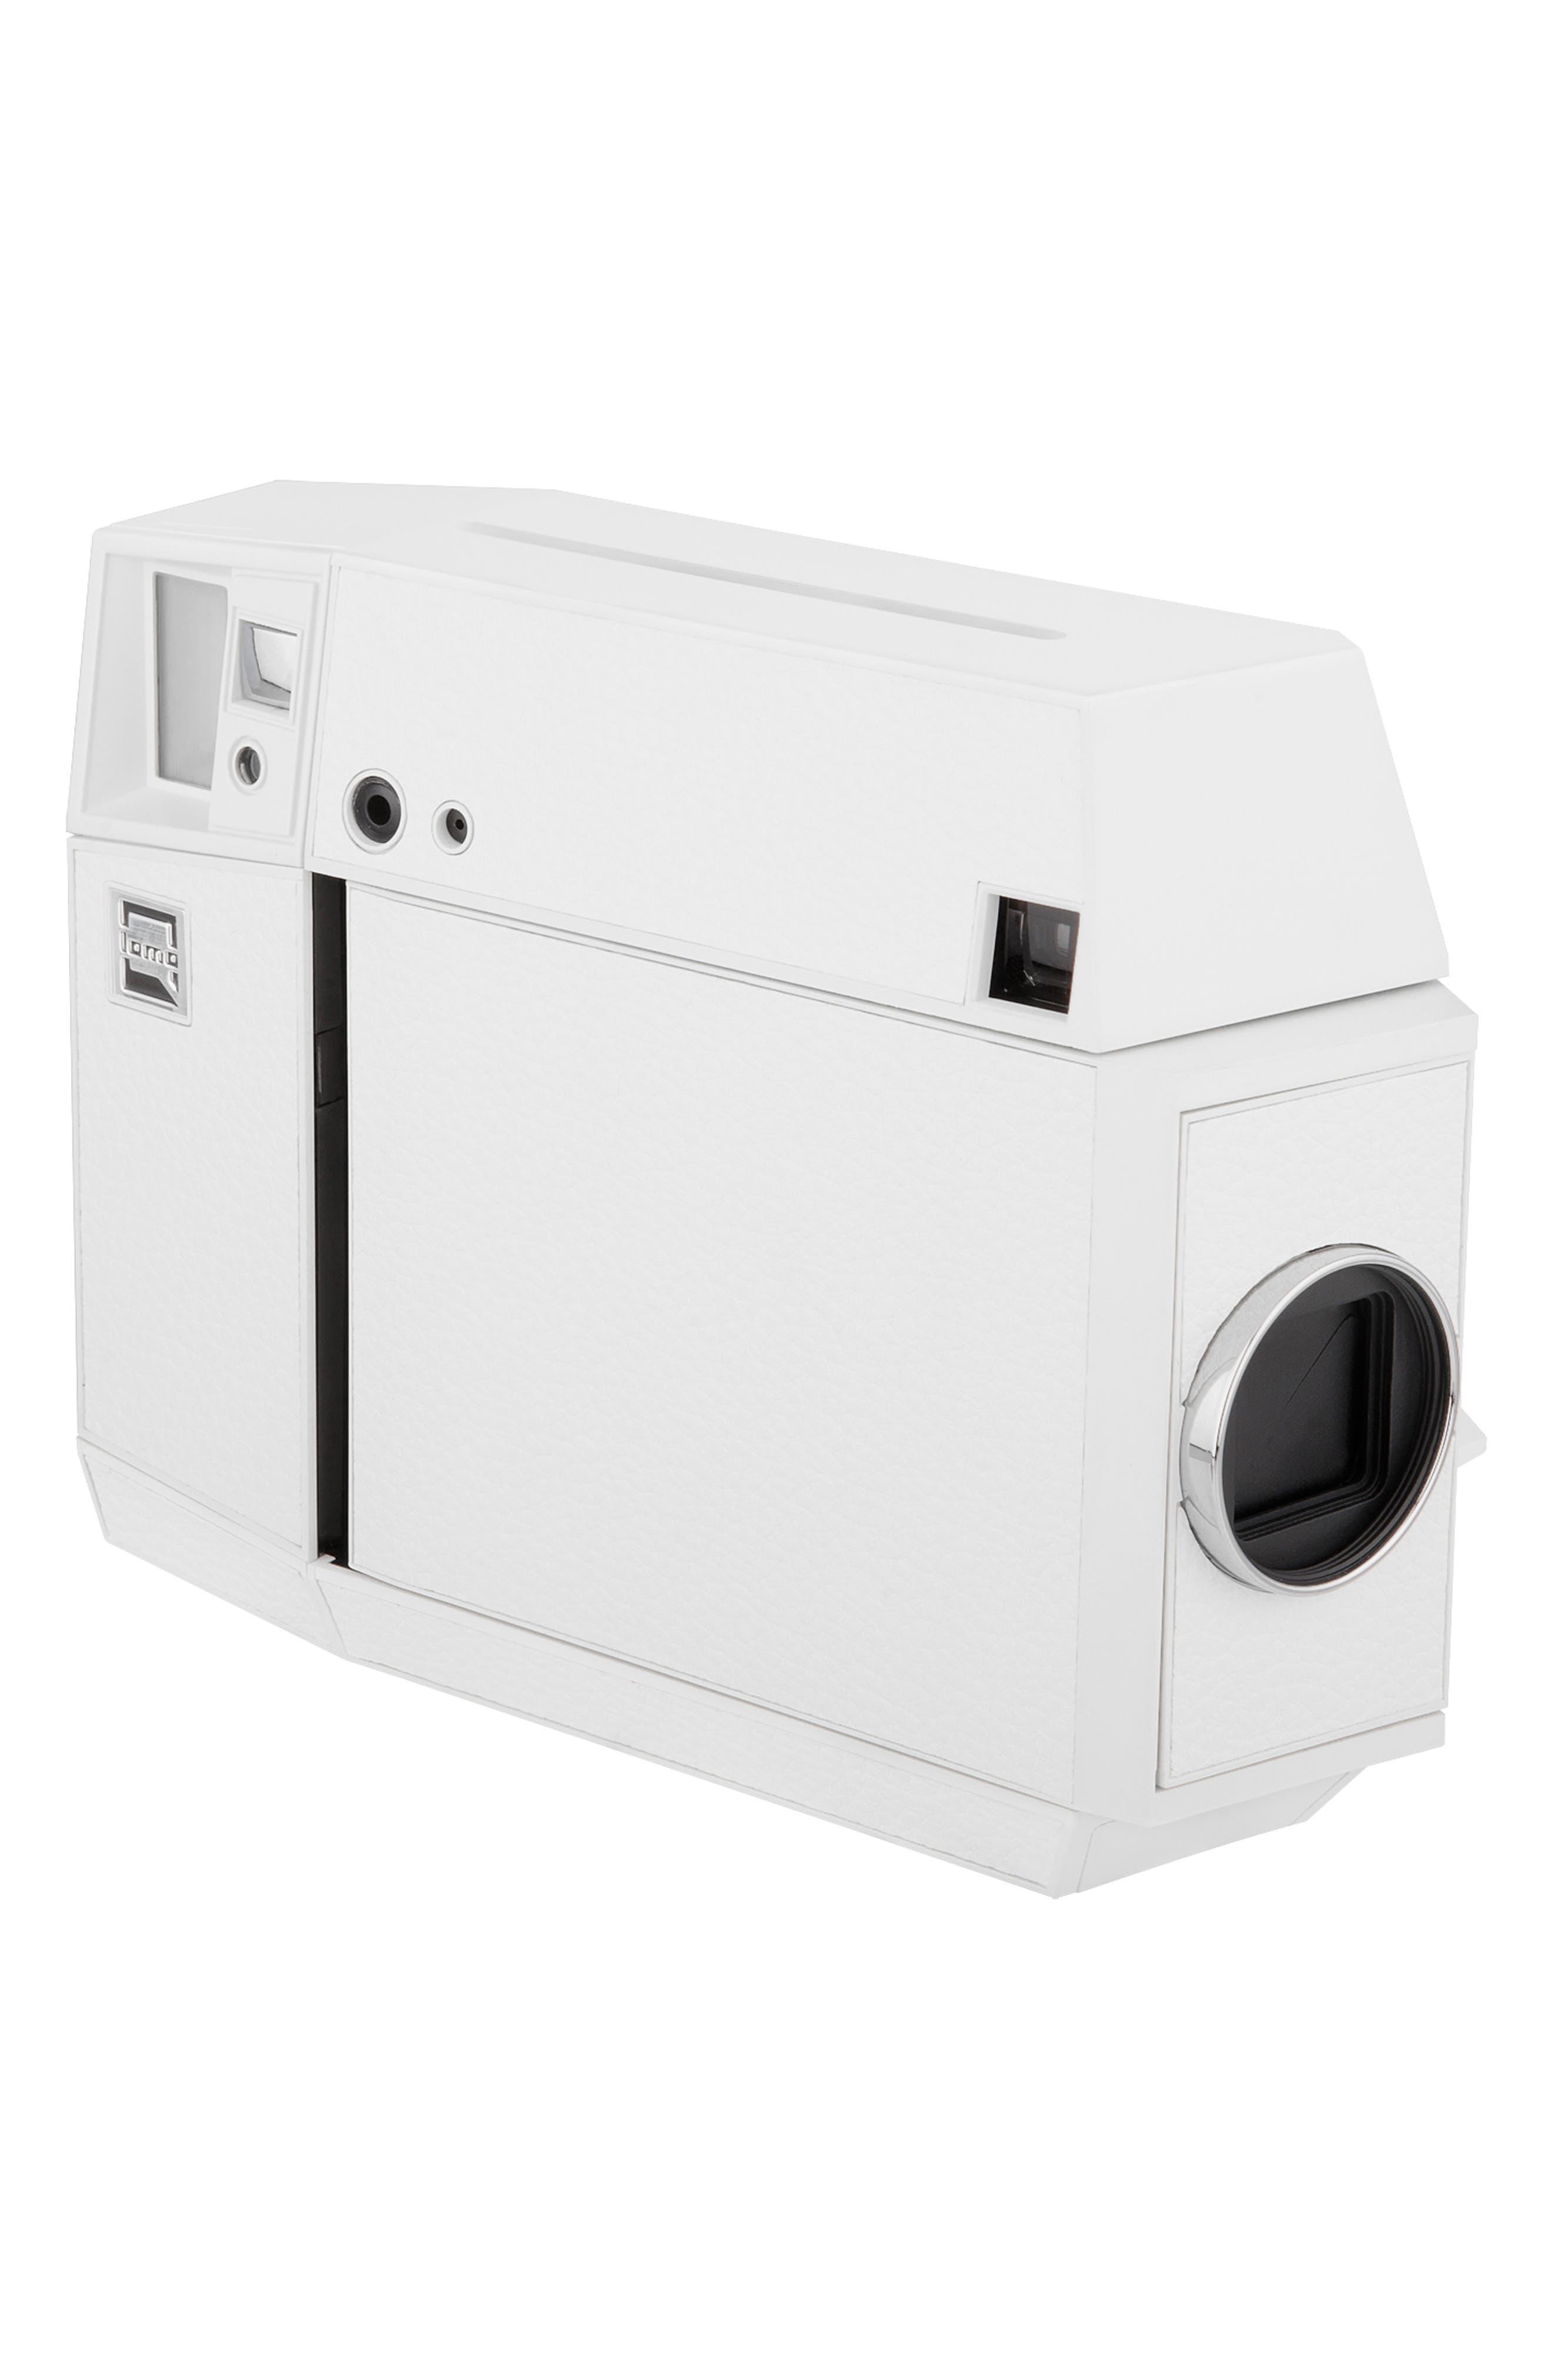 Lomo'Instant Square Glass Black Edition Instant Camera,                             Alternate thumbnail 6, color,                             WHITE